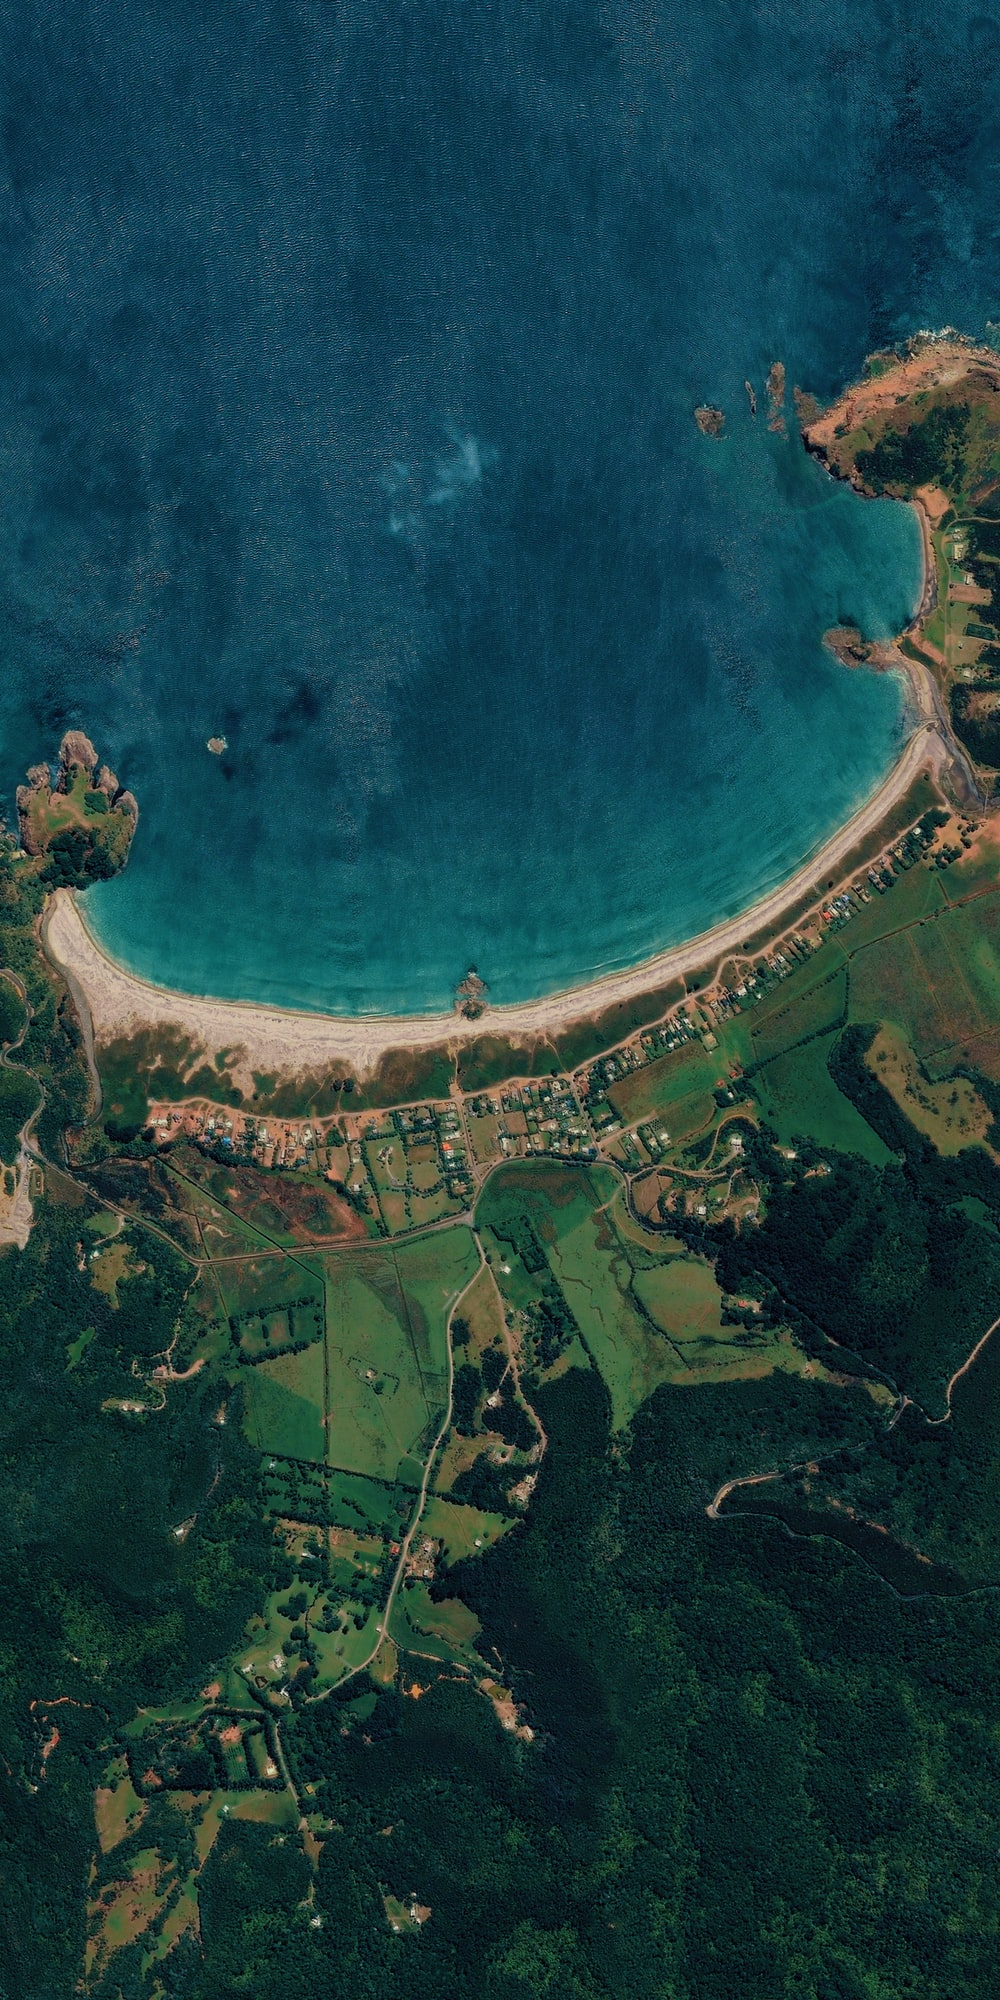 aerial seashore and grass field scenery